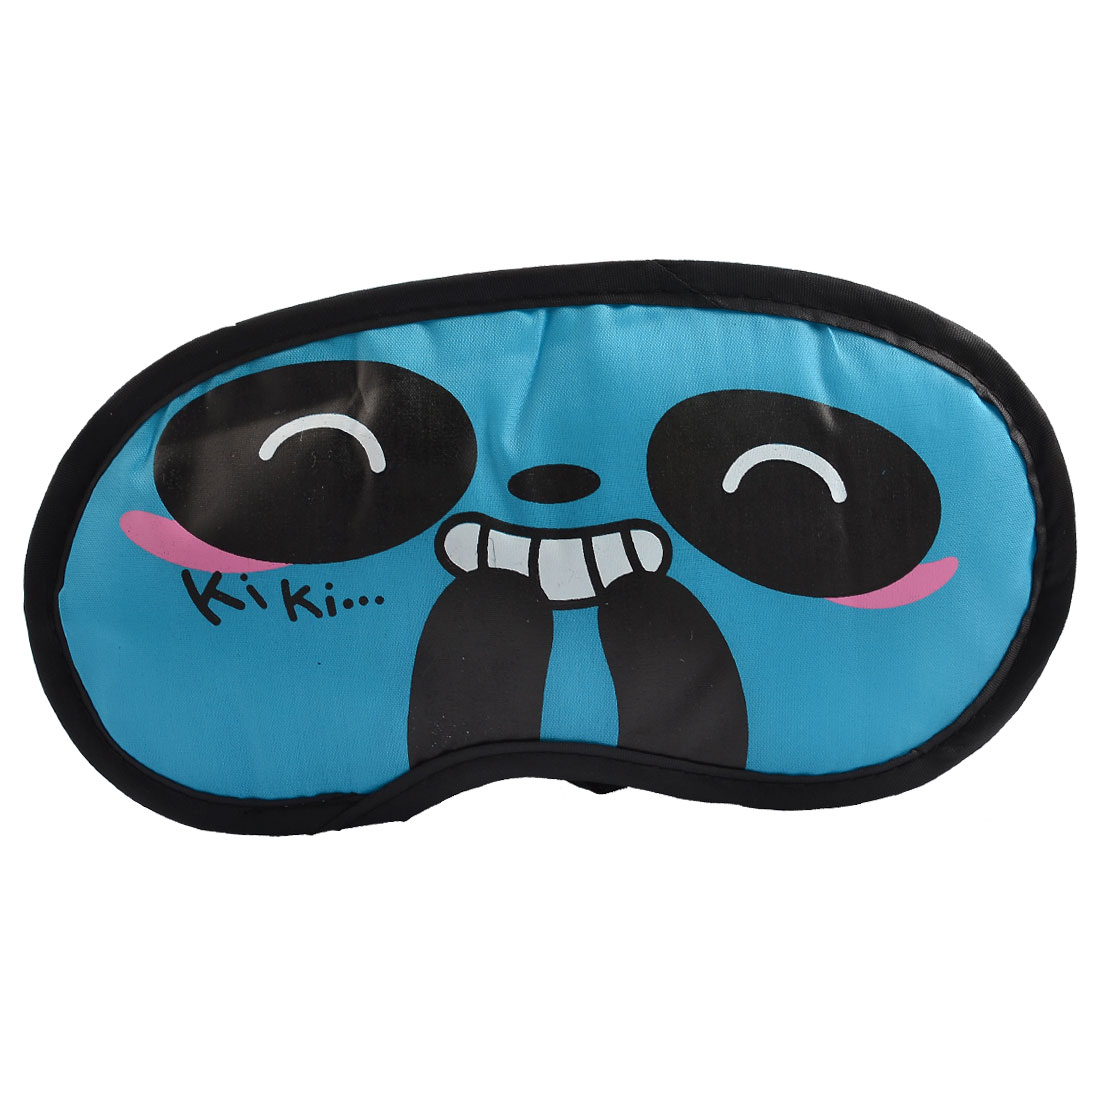 Cartoon Panda Pattern Elastic Strap Eye Blinder Mask Eyeshade Blue